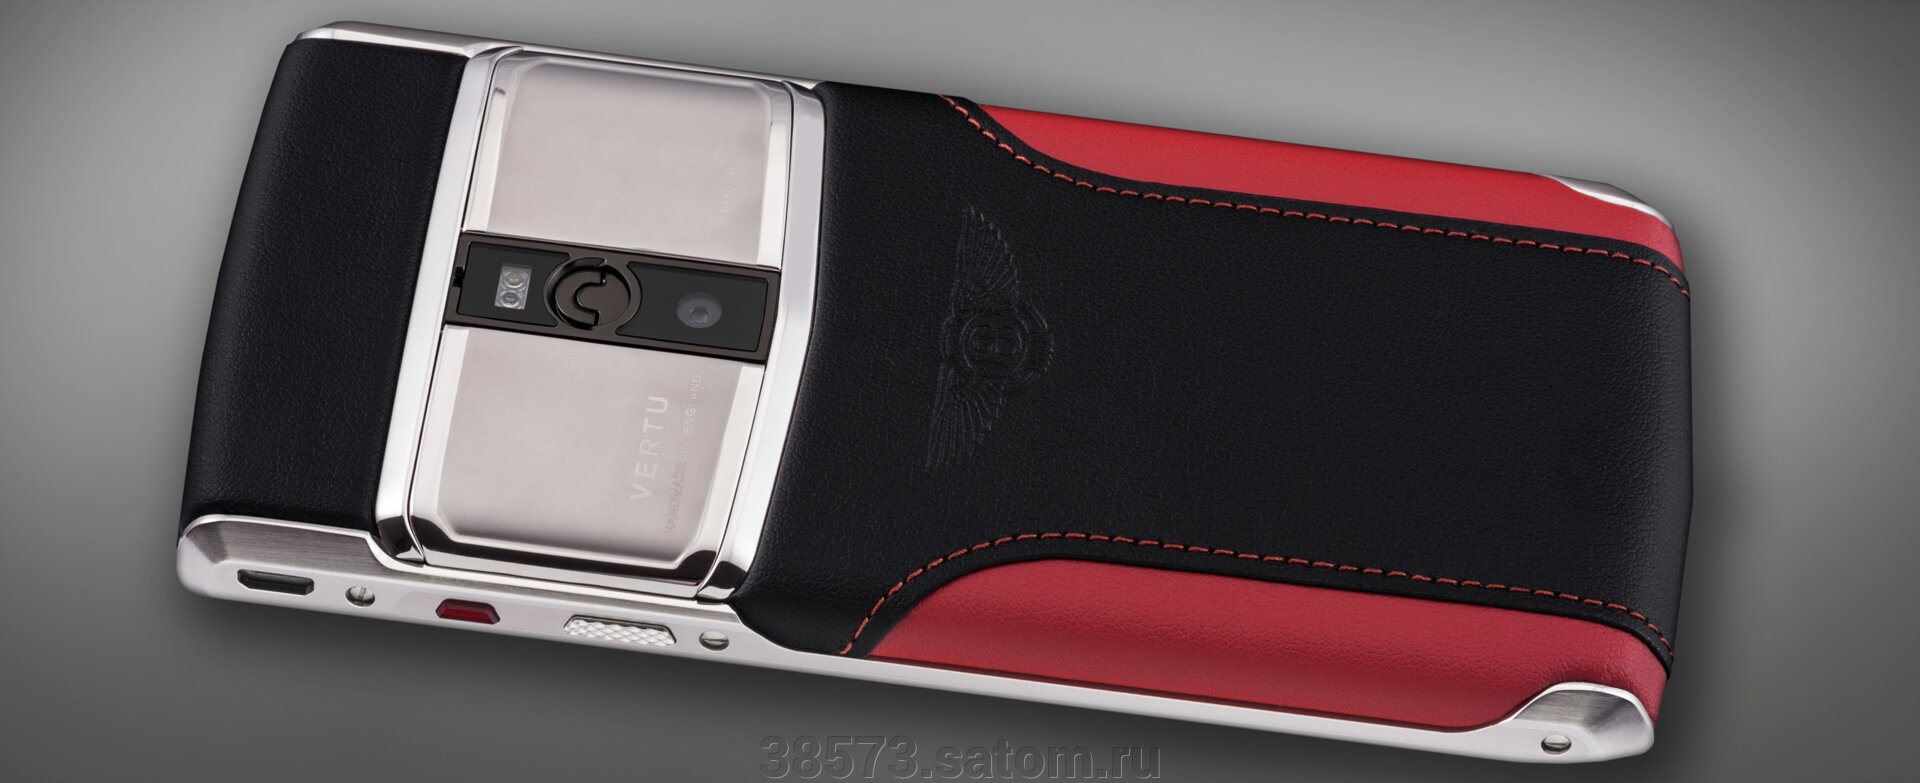 Vertu Signature Touch for Bentley - фото pic_e69ffa81b345aadfdac9a20f9032ff14_1920x9000_1.jpg